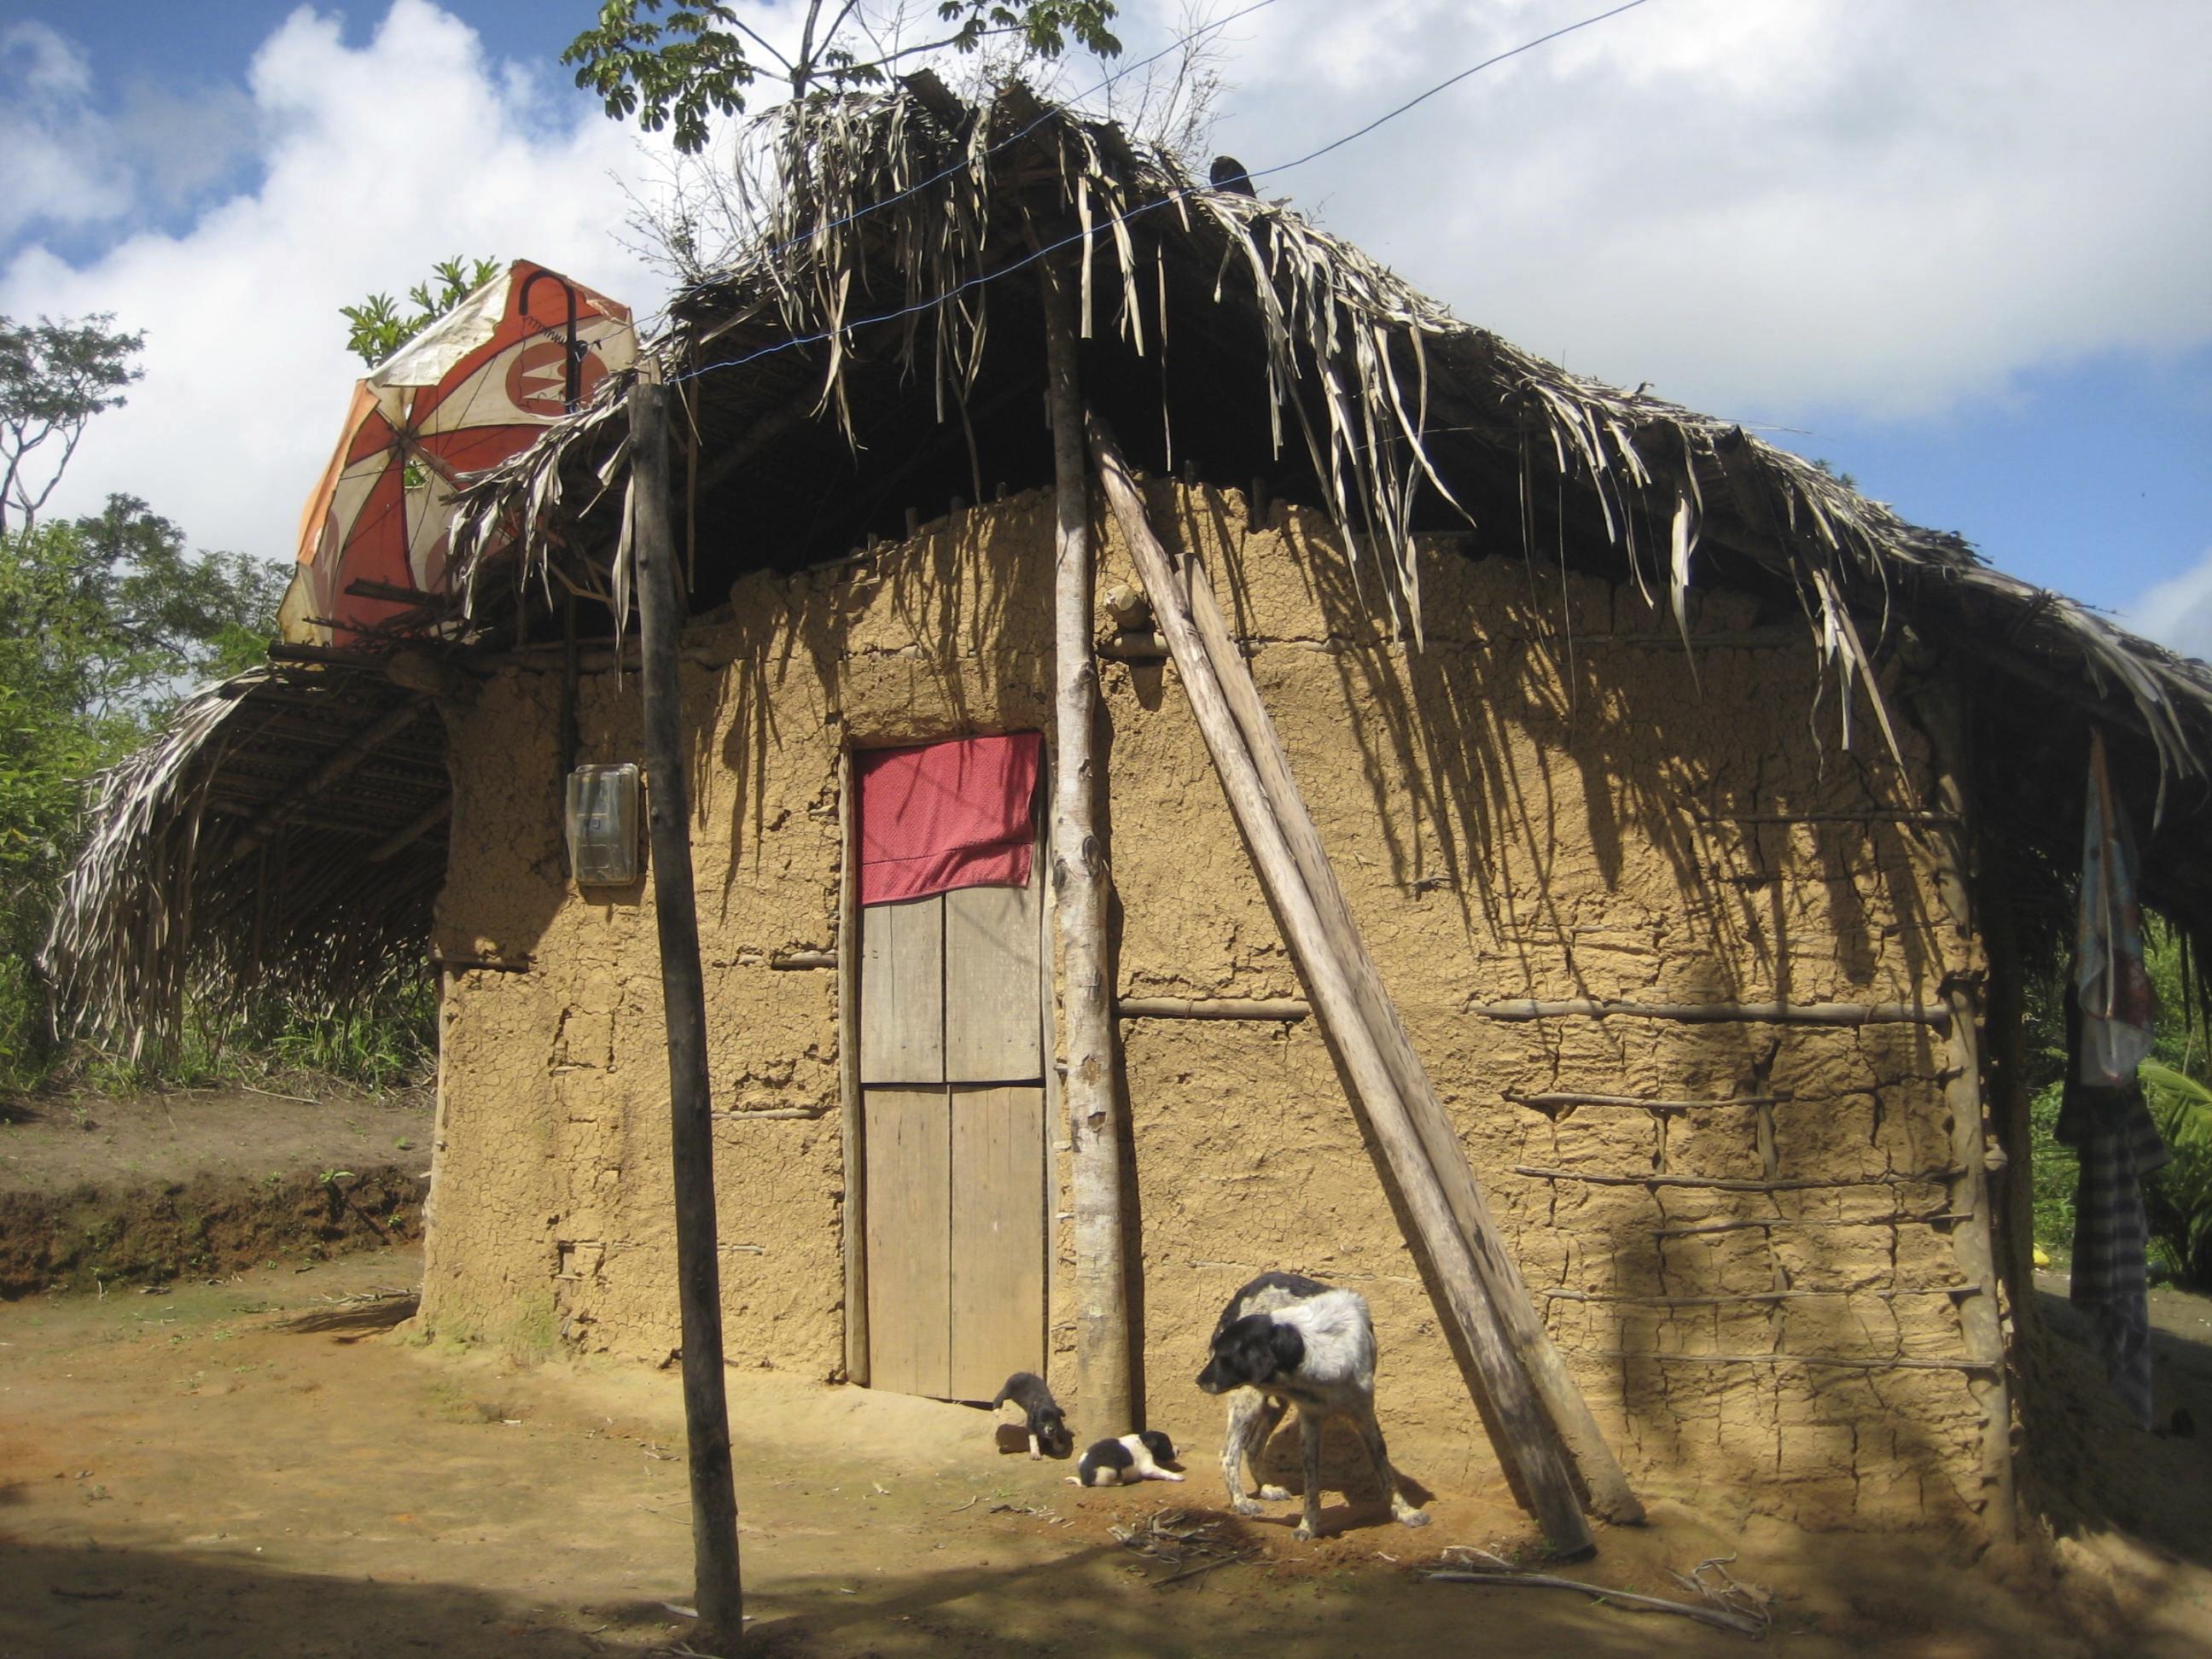 Serra da Barriga inhabitants' house. Photo by Maria Fernanda Escallón.